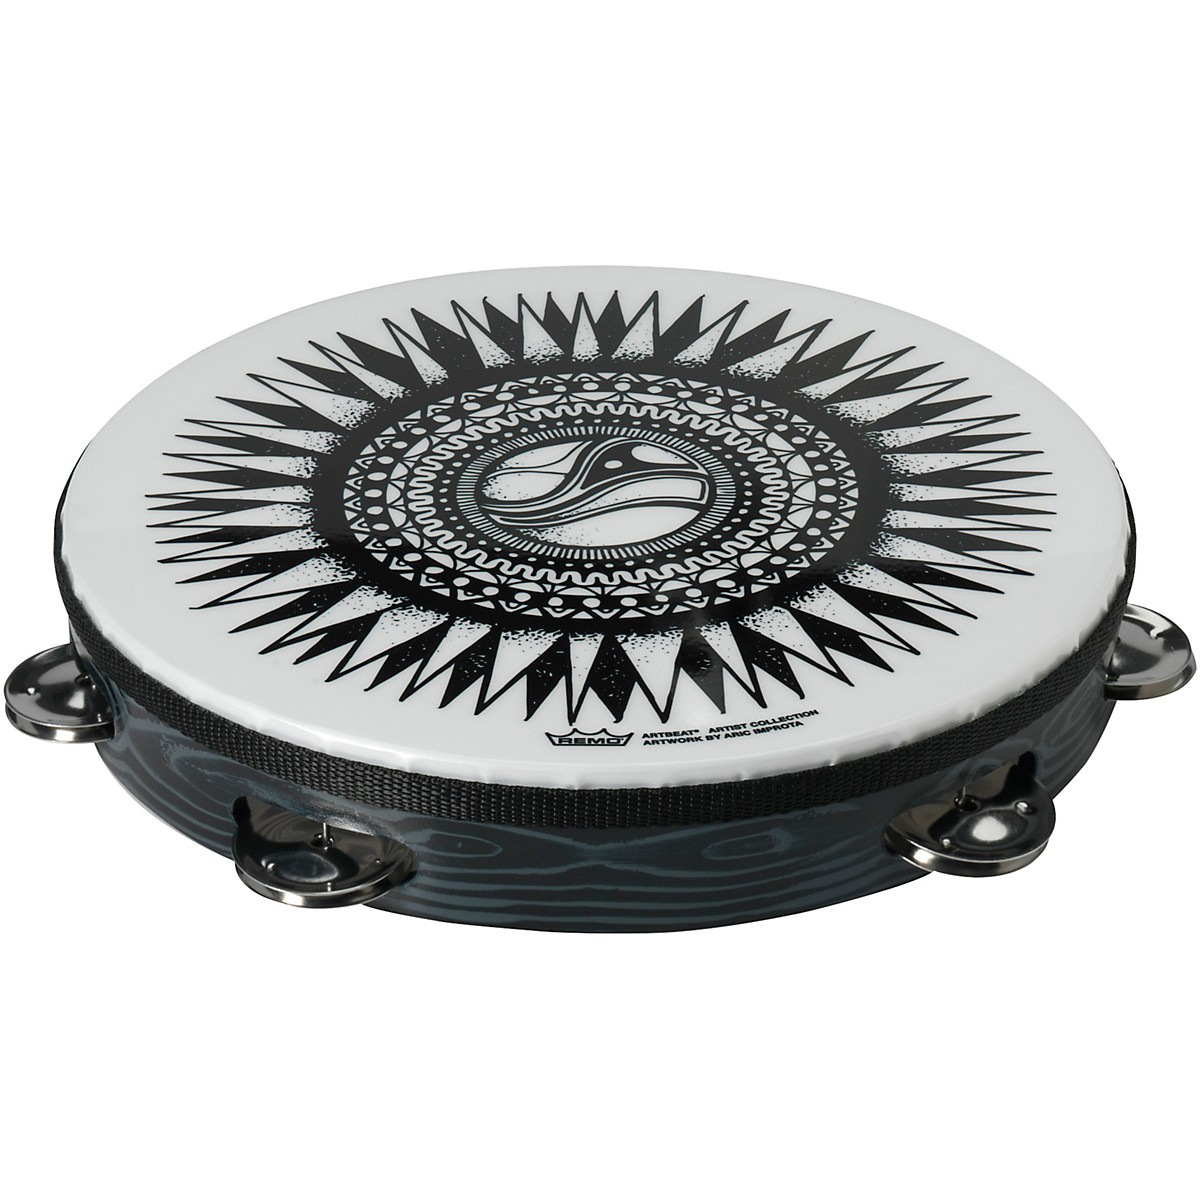 Remo ArtBEAT Aric Improta New Sun Artist Collection Tambourine